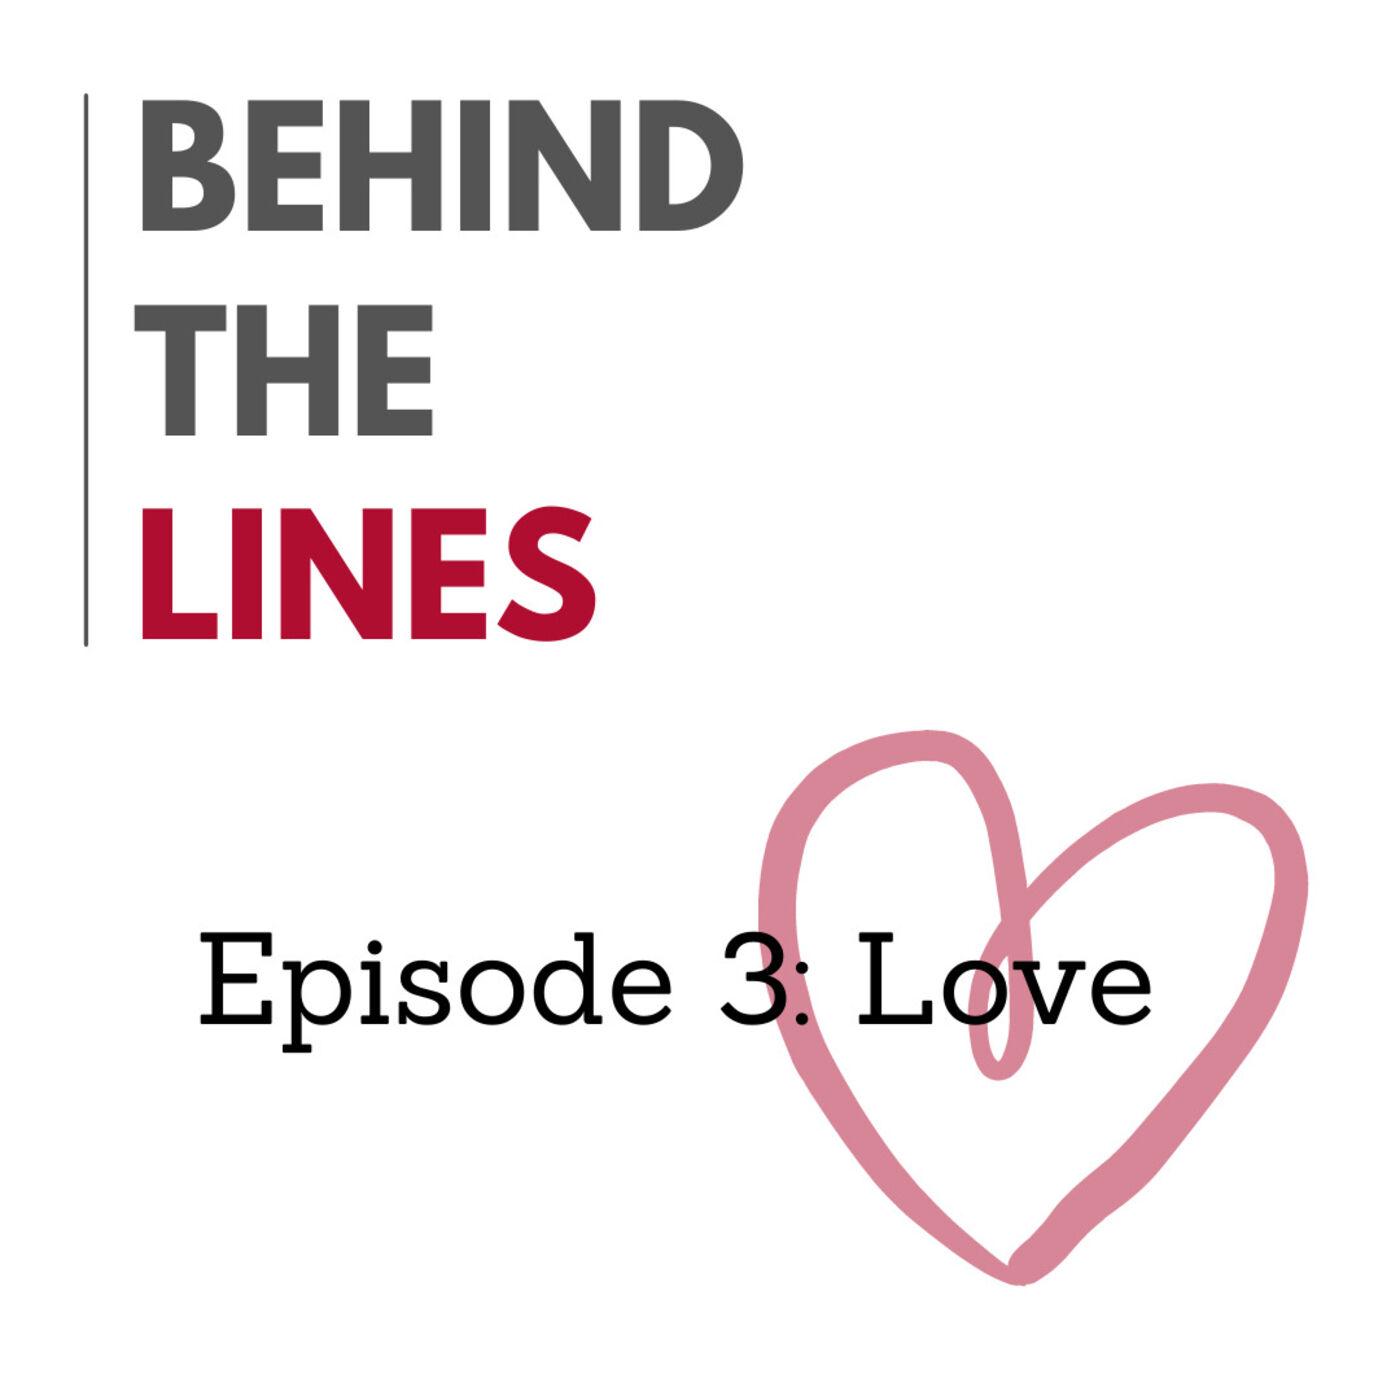 Episode 3: Love